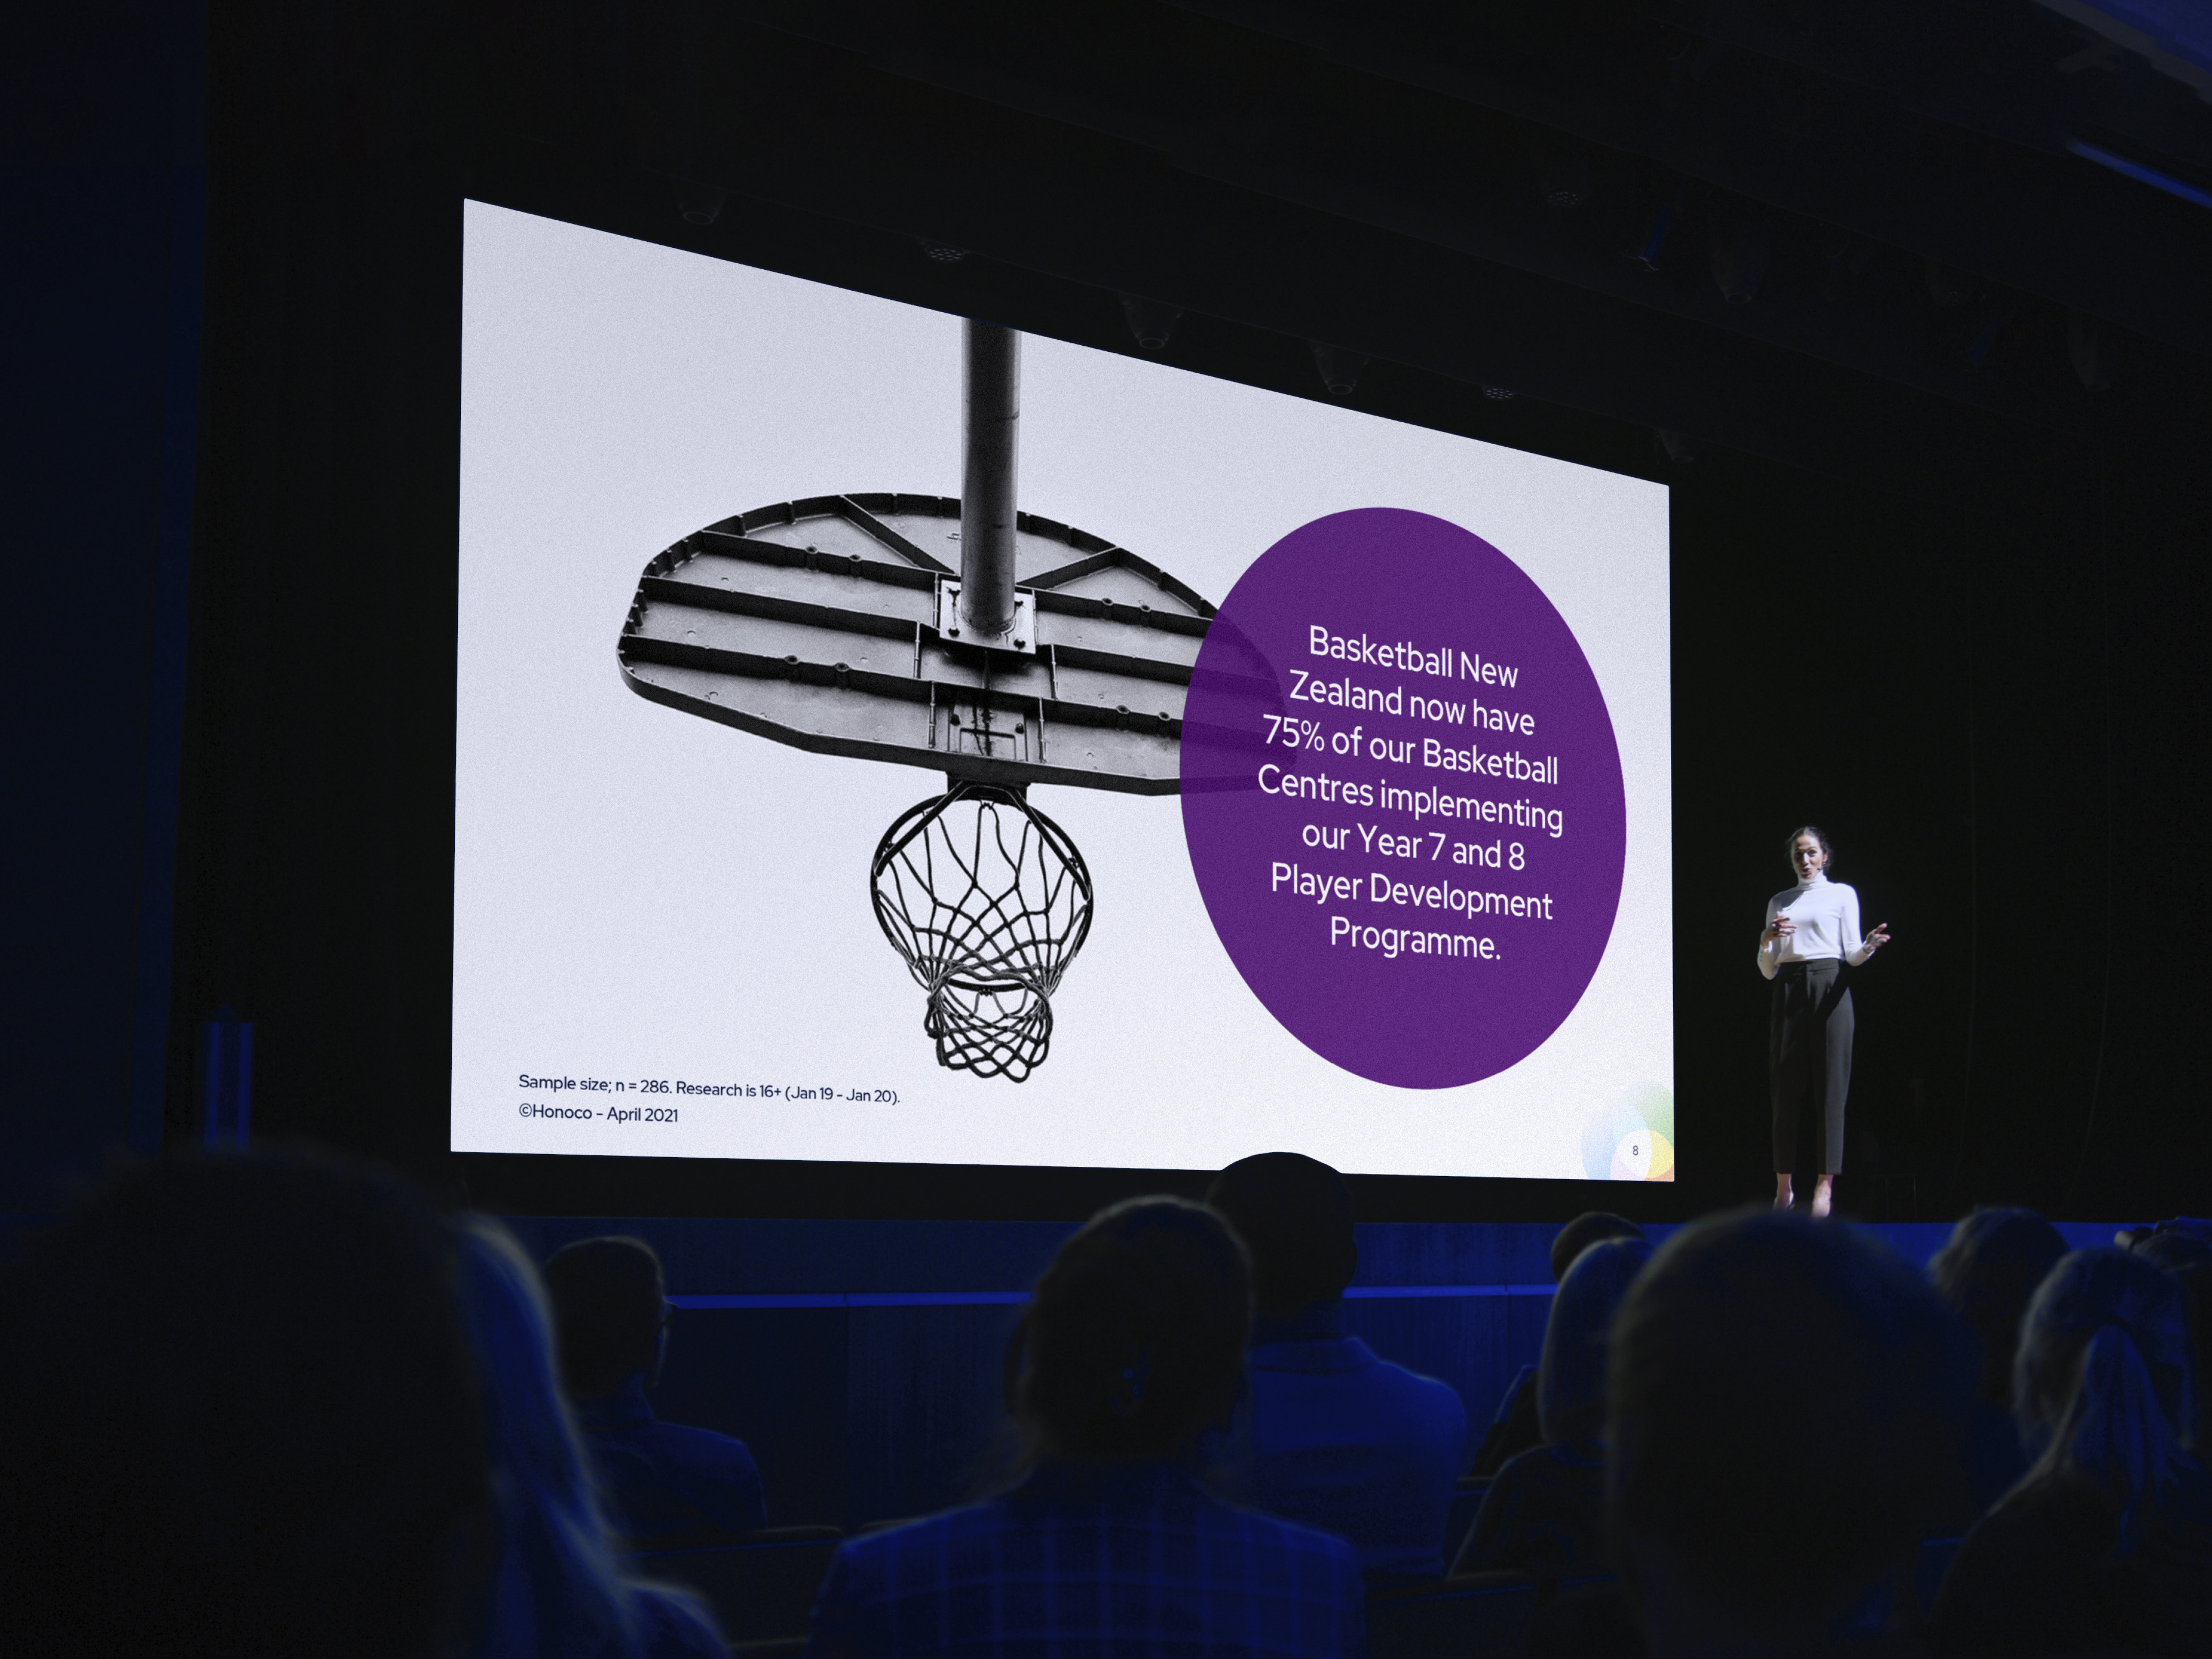 PPT presentation on screen